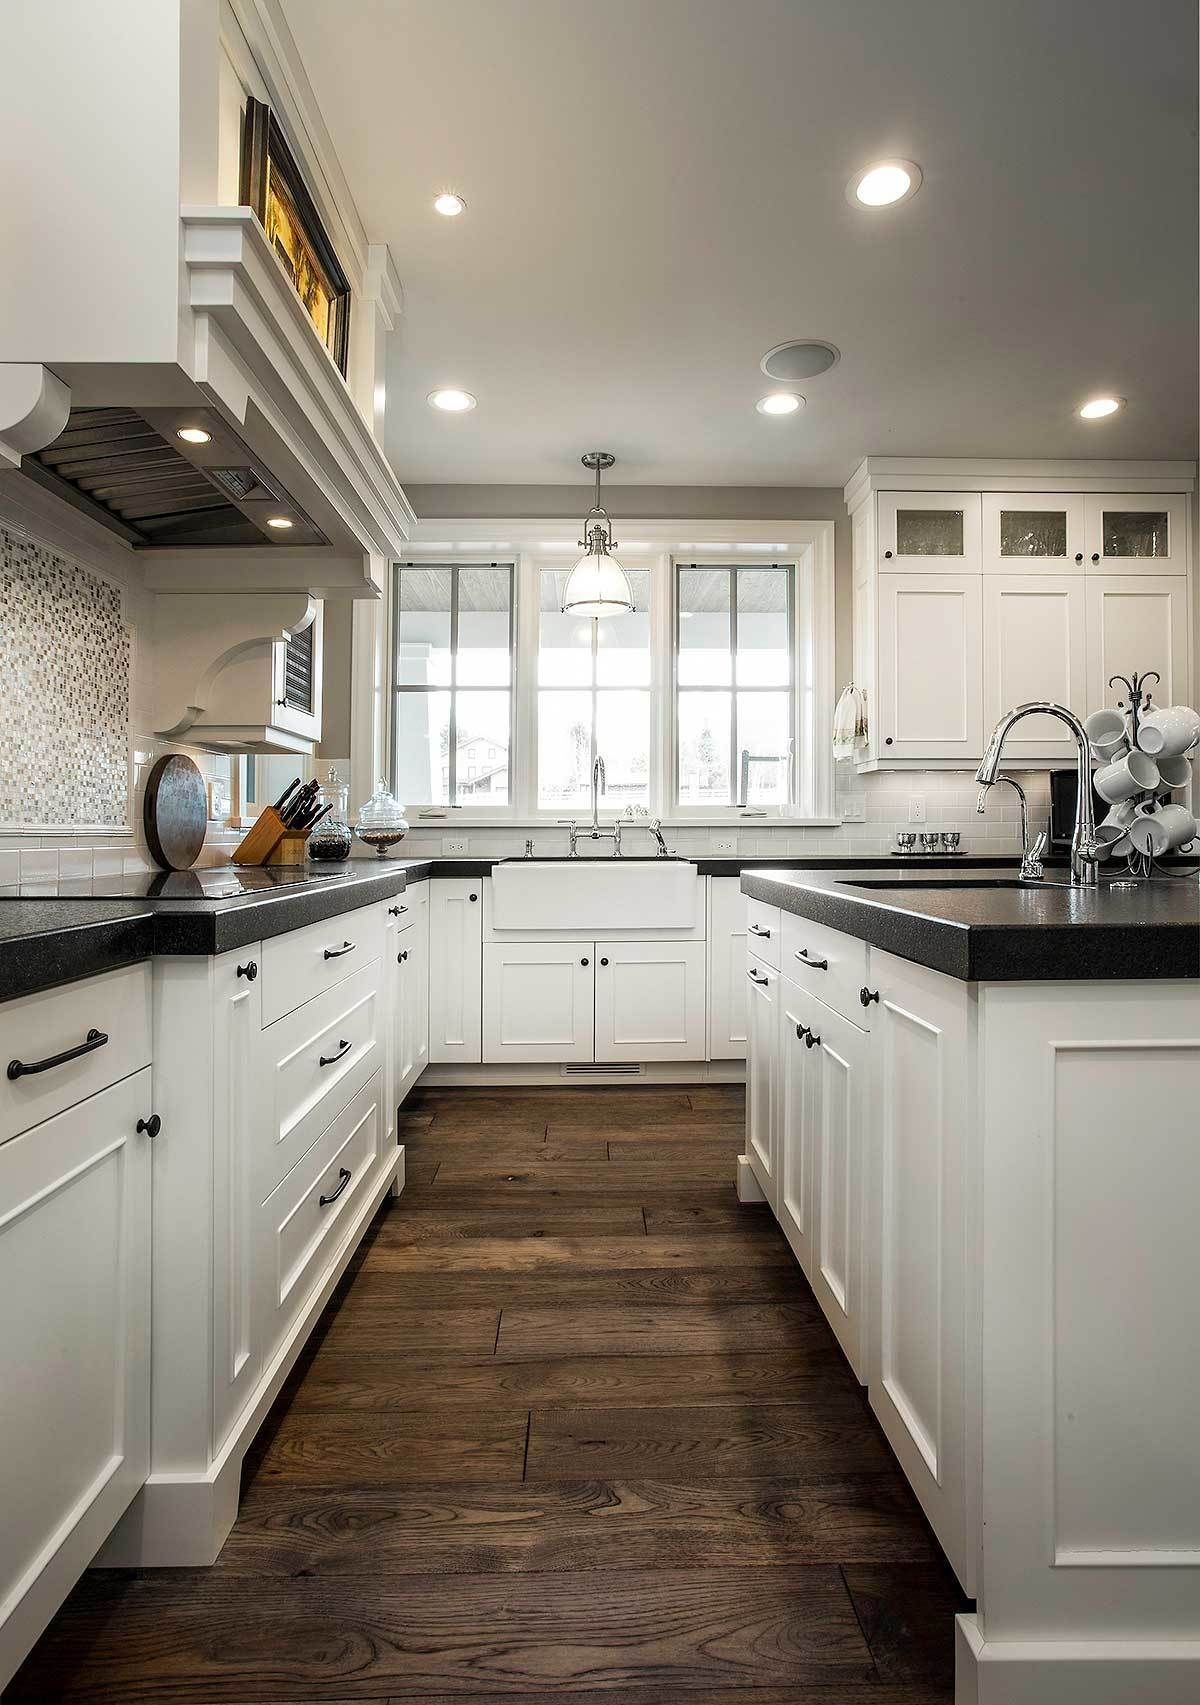 Plan 18295be Exclusive Luxury Craftsman With No Detail Spared Craftsman Style Kitchens Craftsman Home Interiors Craftsman Kitchen Cabinets